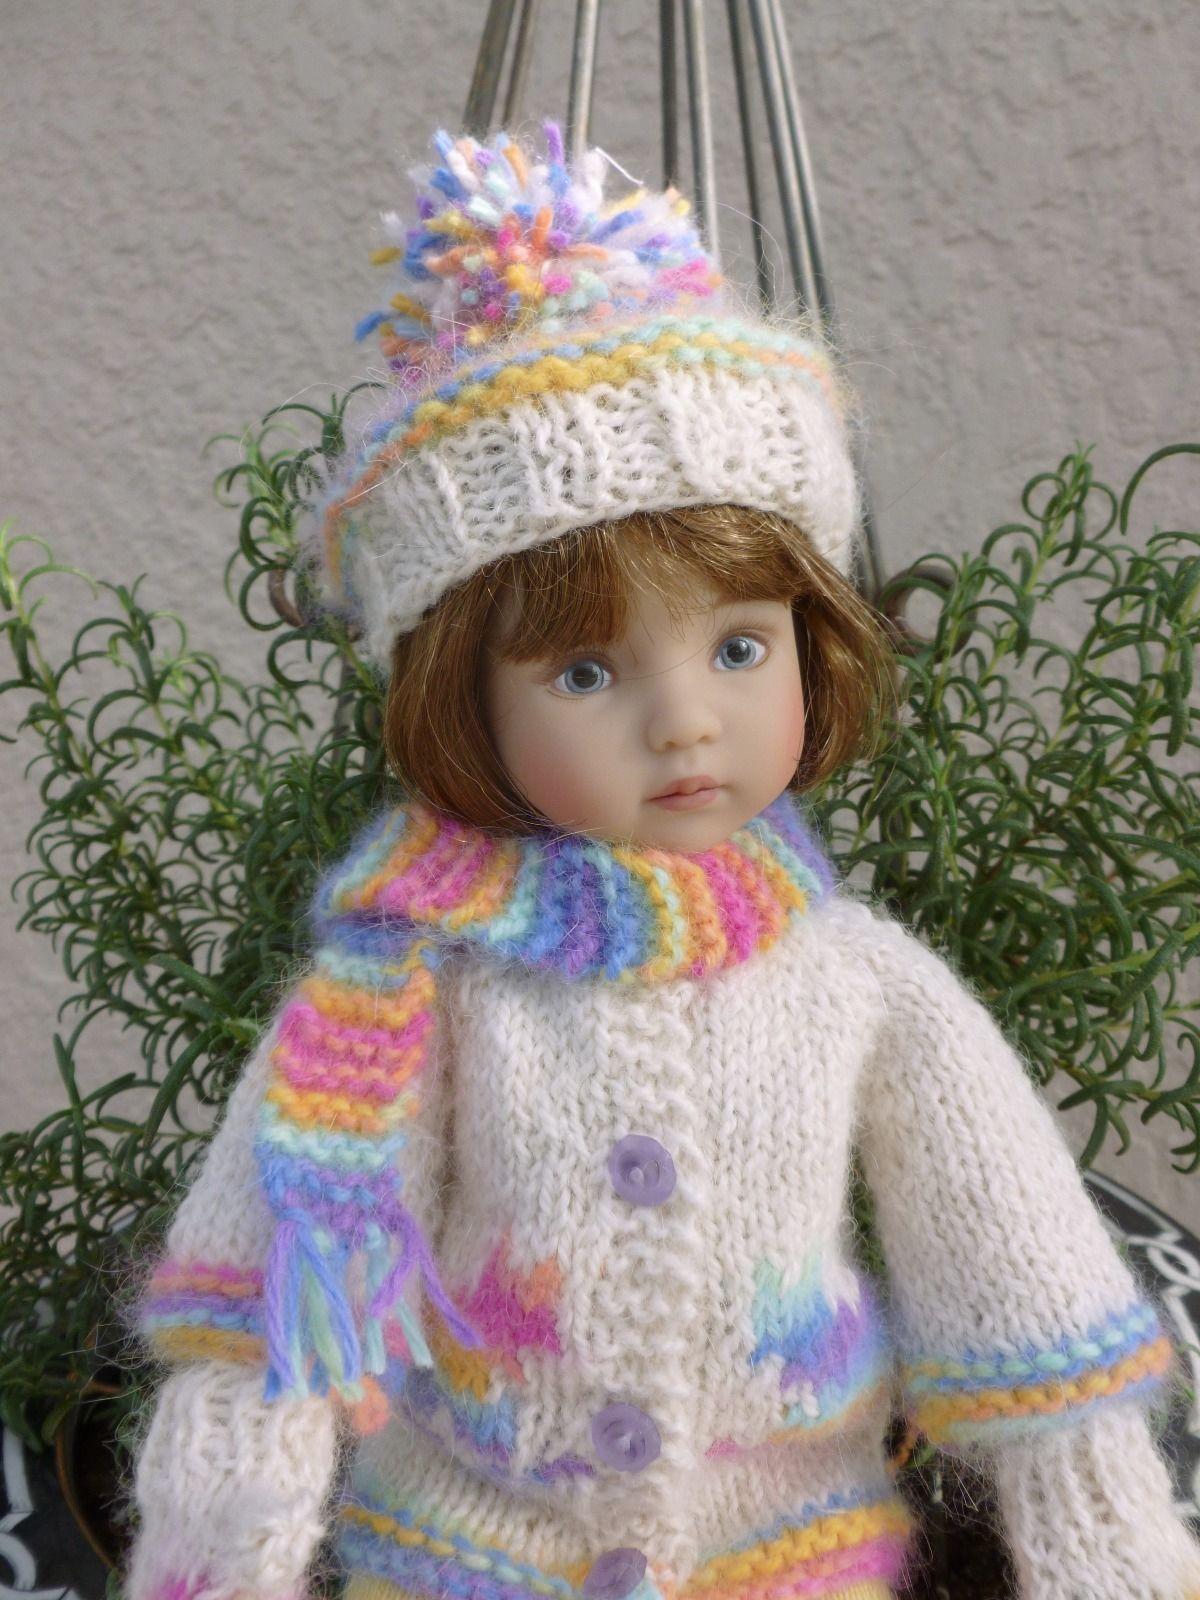 034 Calico Kittens 034 for Effner 039 s 034 Little Darling 034 Angora Kittens on Alpaca Outfit   eBay